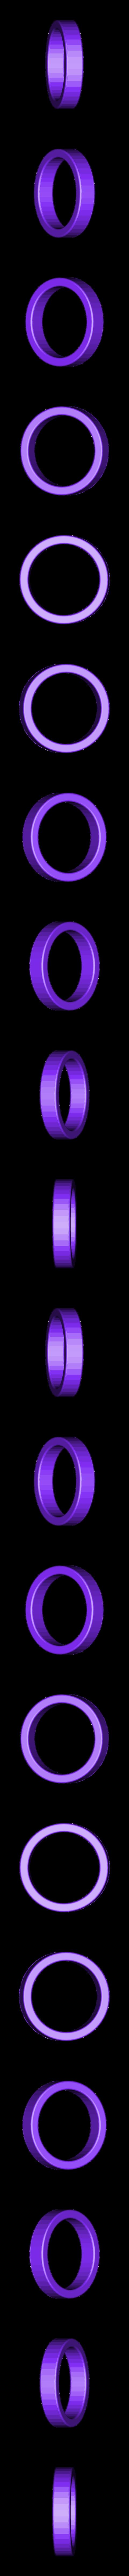 band voor.stl Download free STL file quad (custom) • 3D printing design, jasperbaudoin